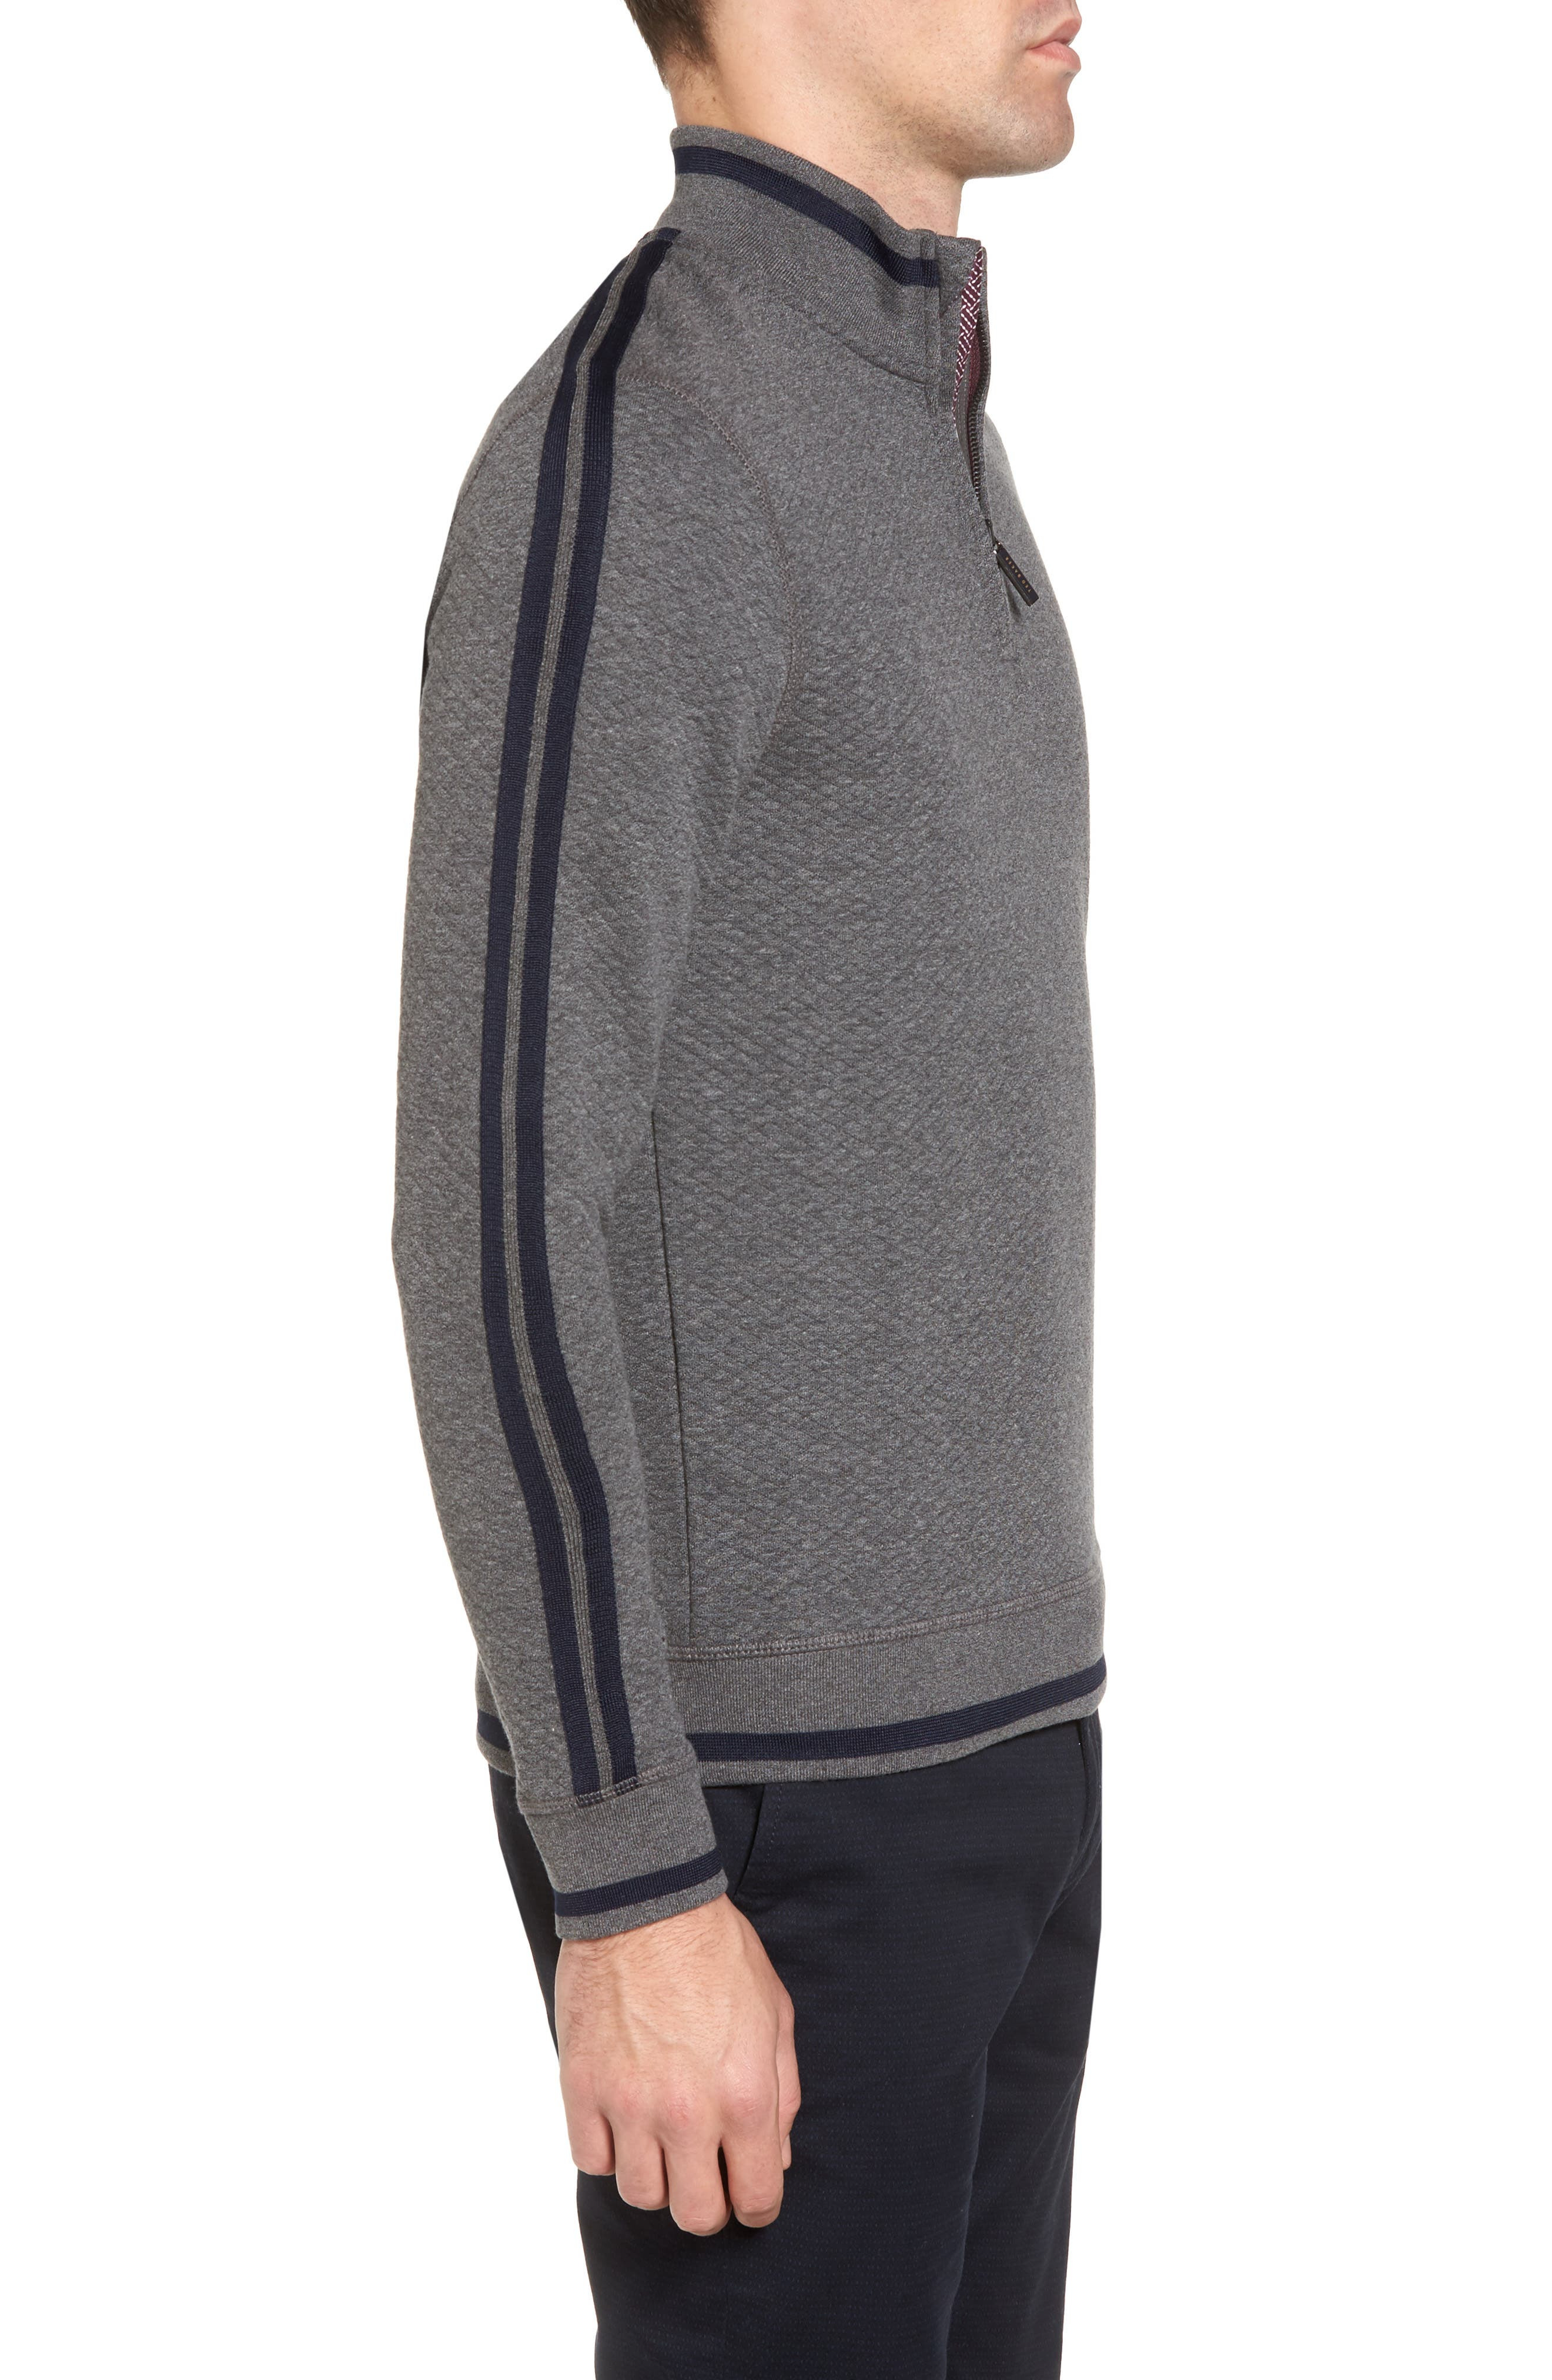 Sidney Quilted Quarter Zip Sweatshirt,                             Alternate thumbnail 3, color,                             Charcaol